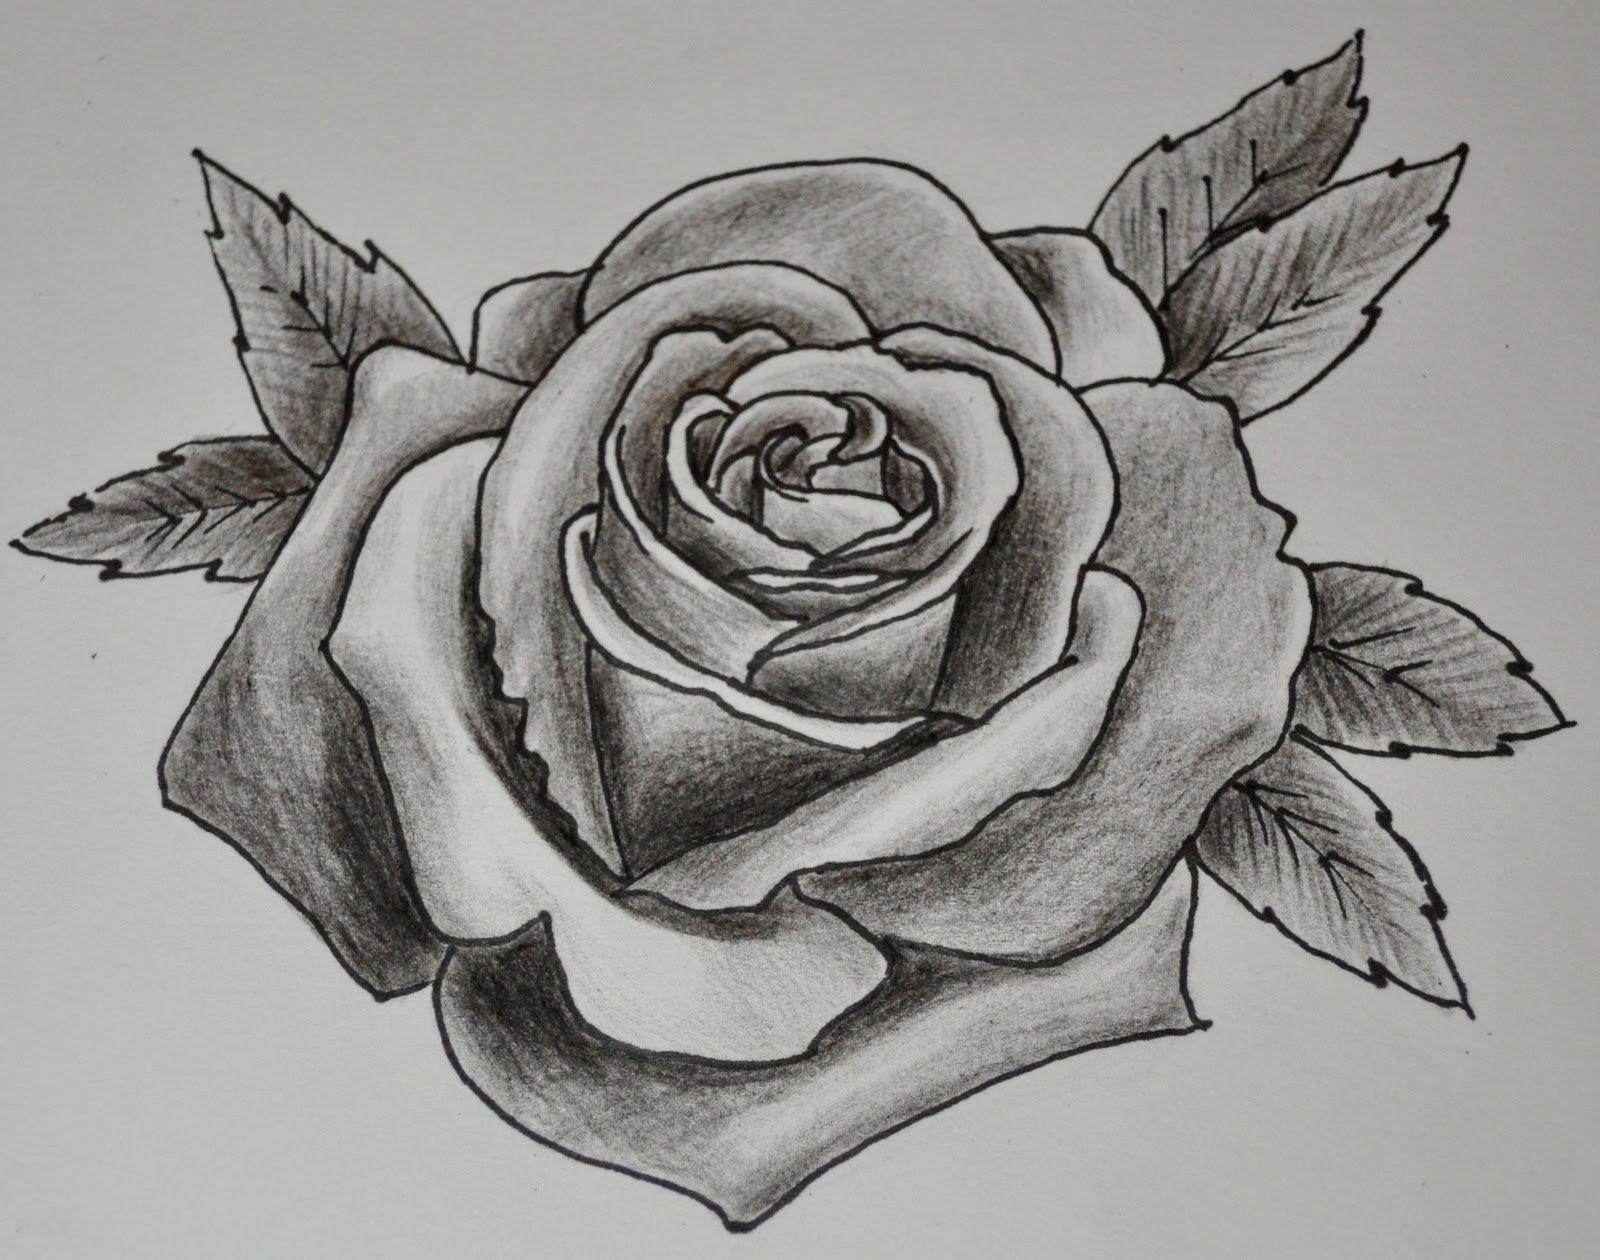 drawings of roses - HD1600×1260